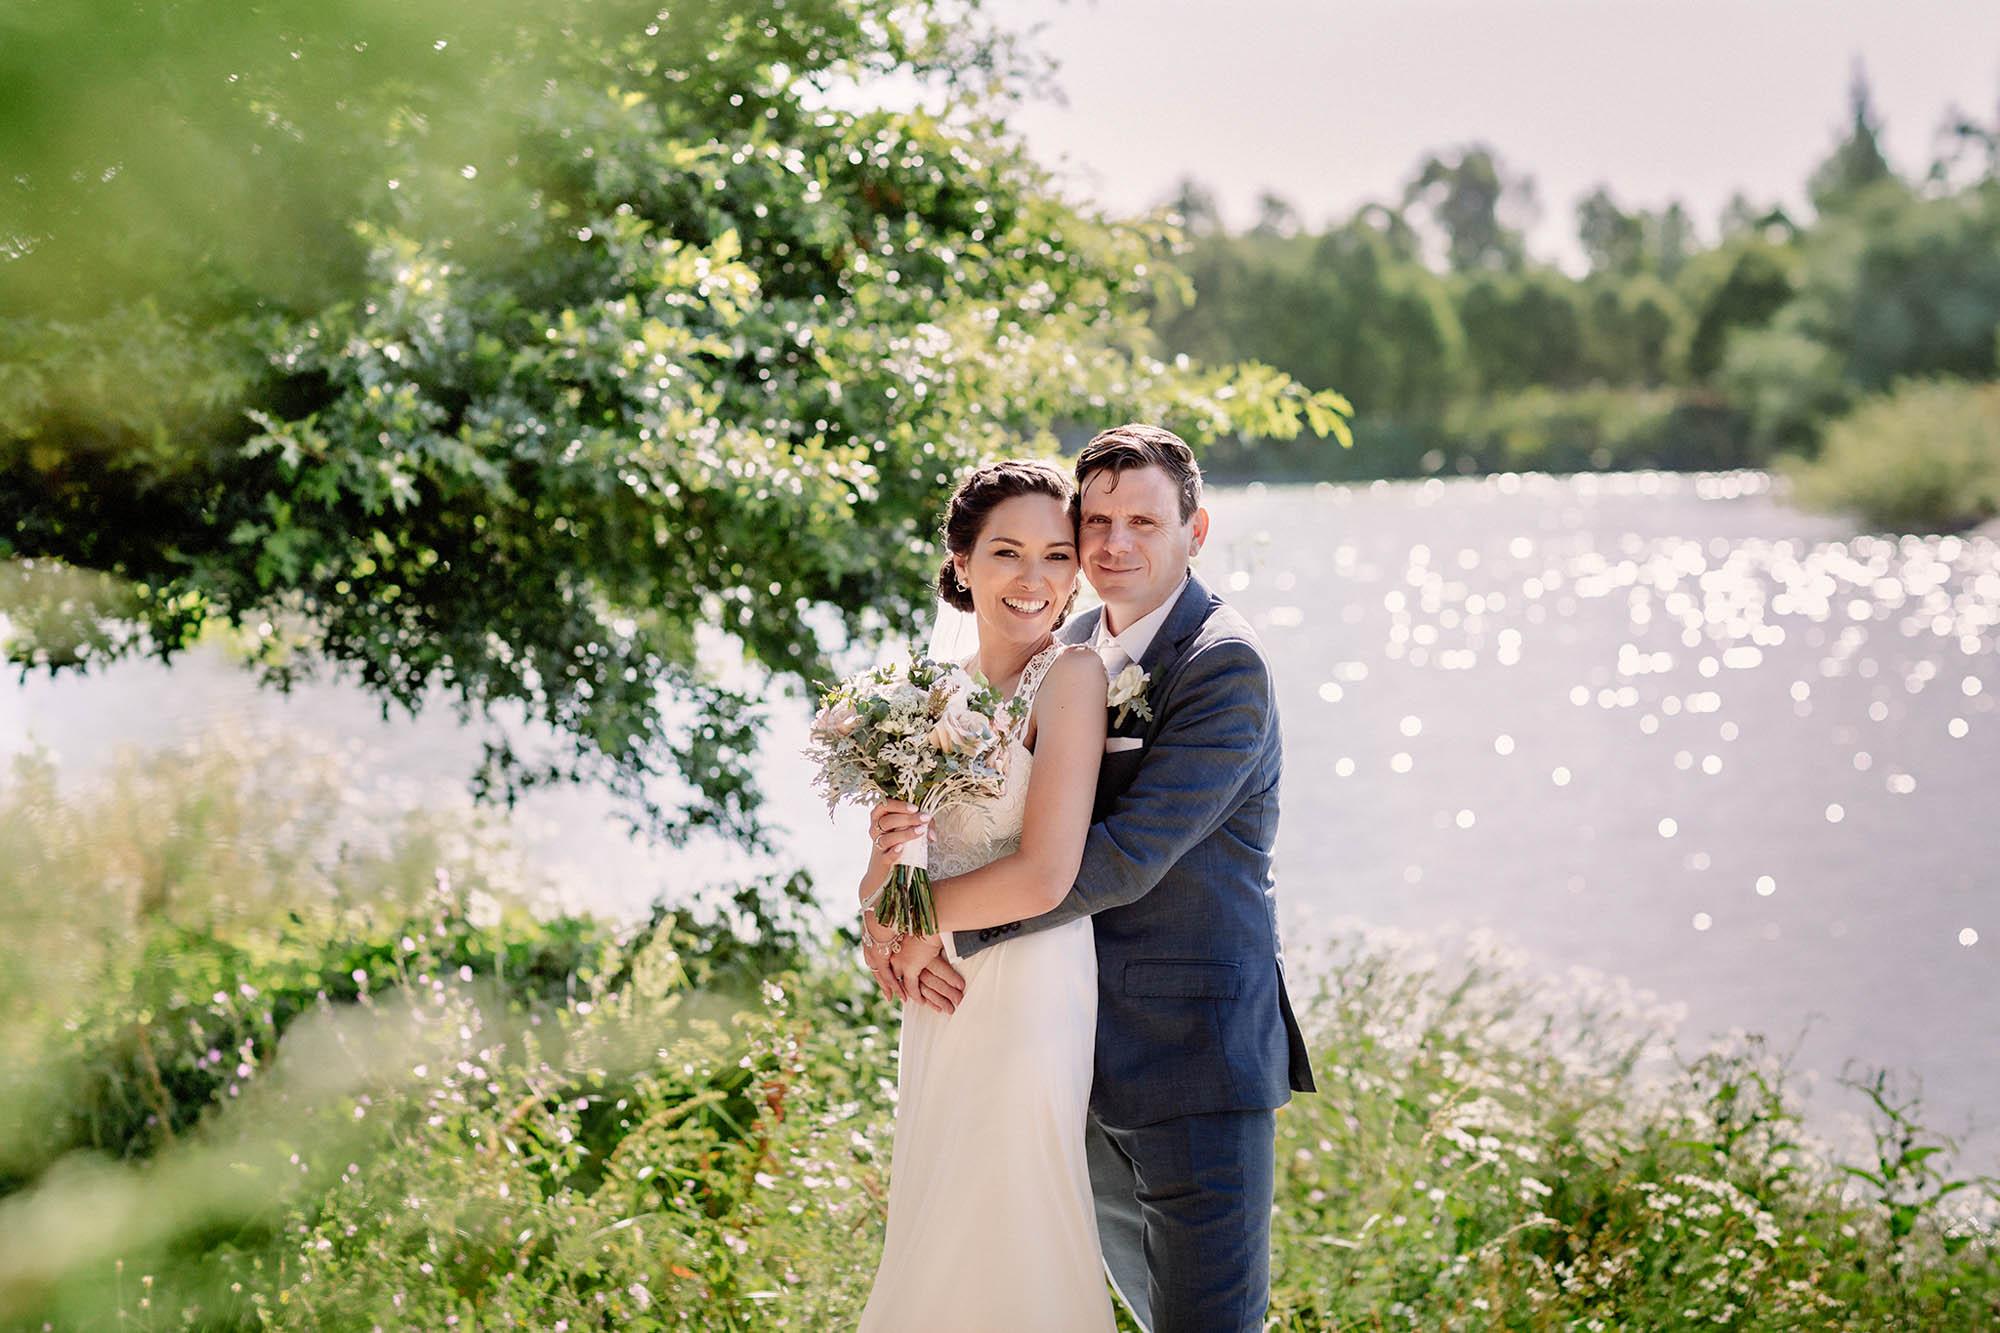 Darjon vineyard wedding photograph